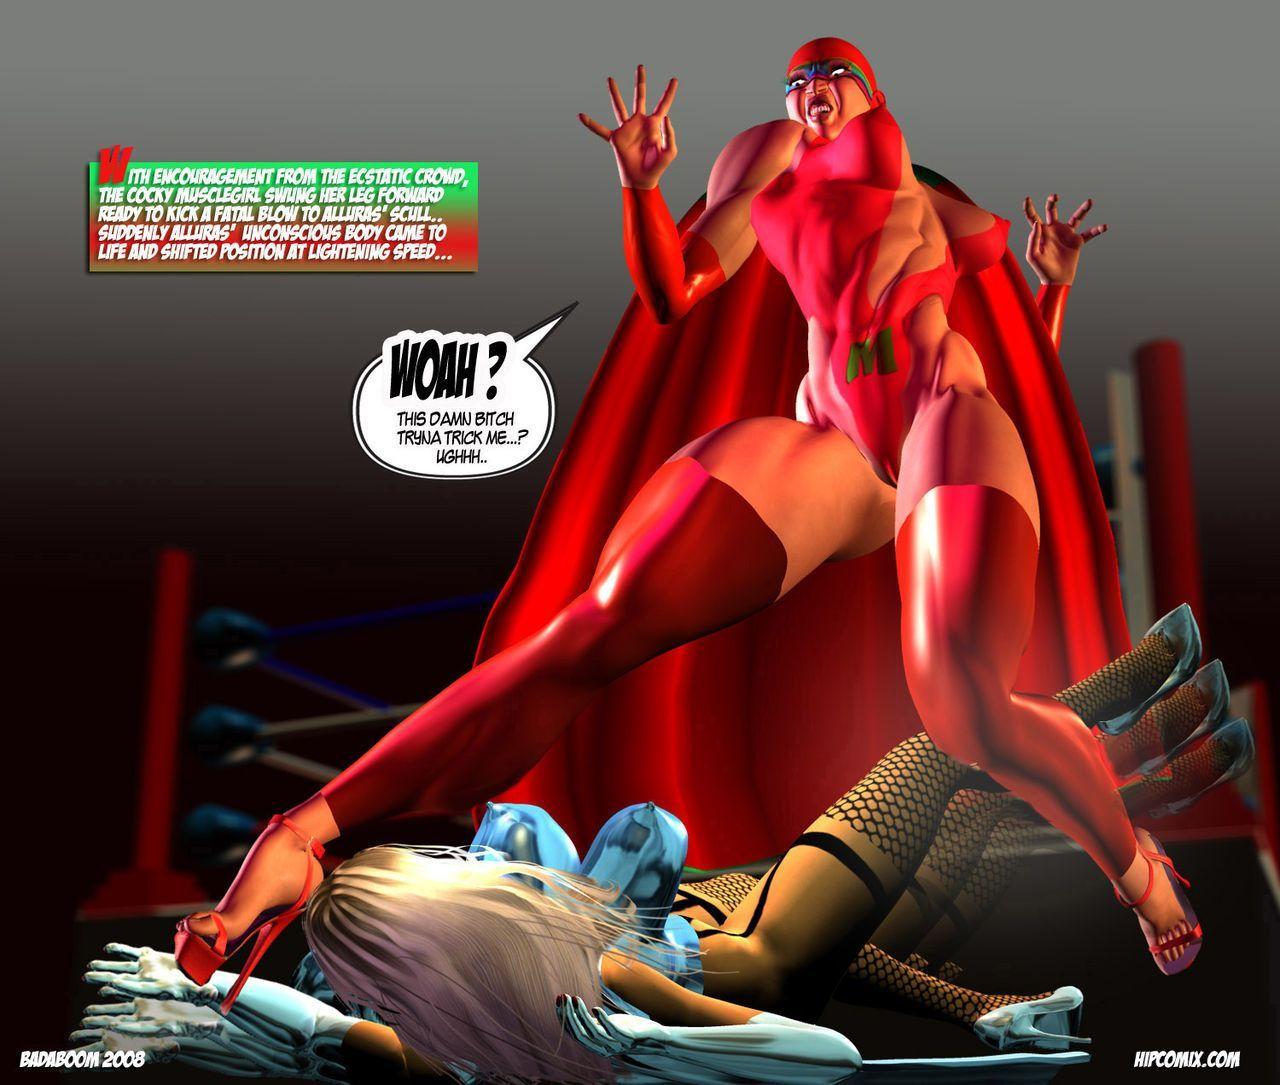 Badaboom Allura 6 Issue 13 - 15 (English) - part 2